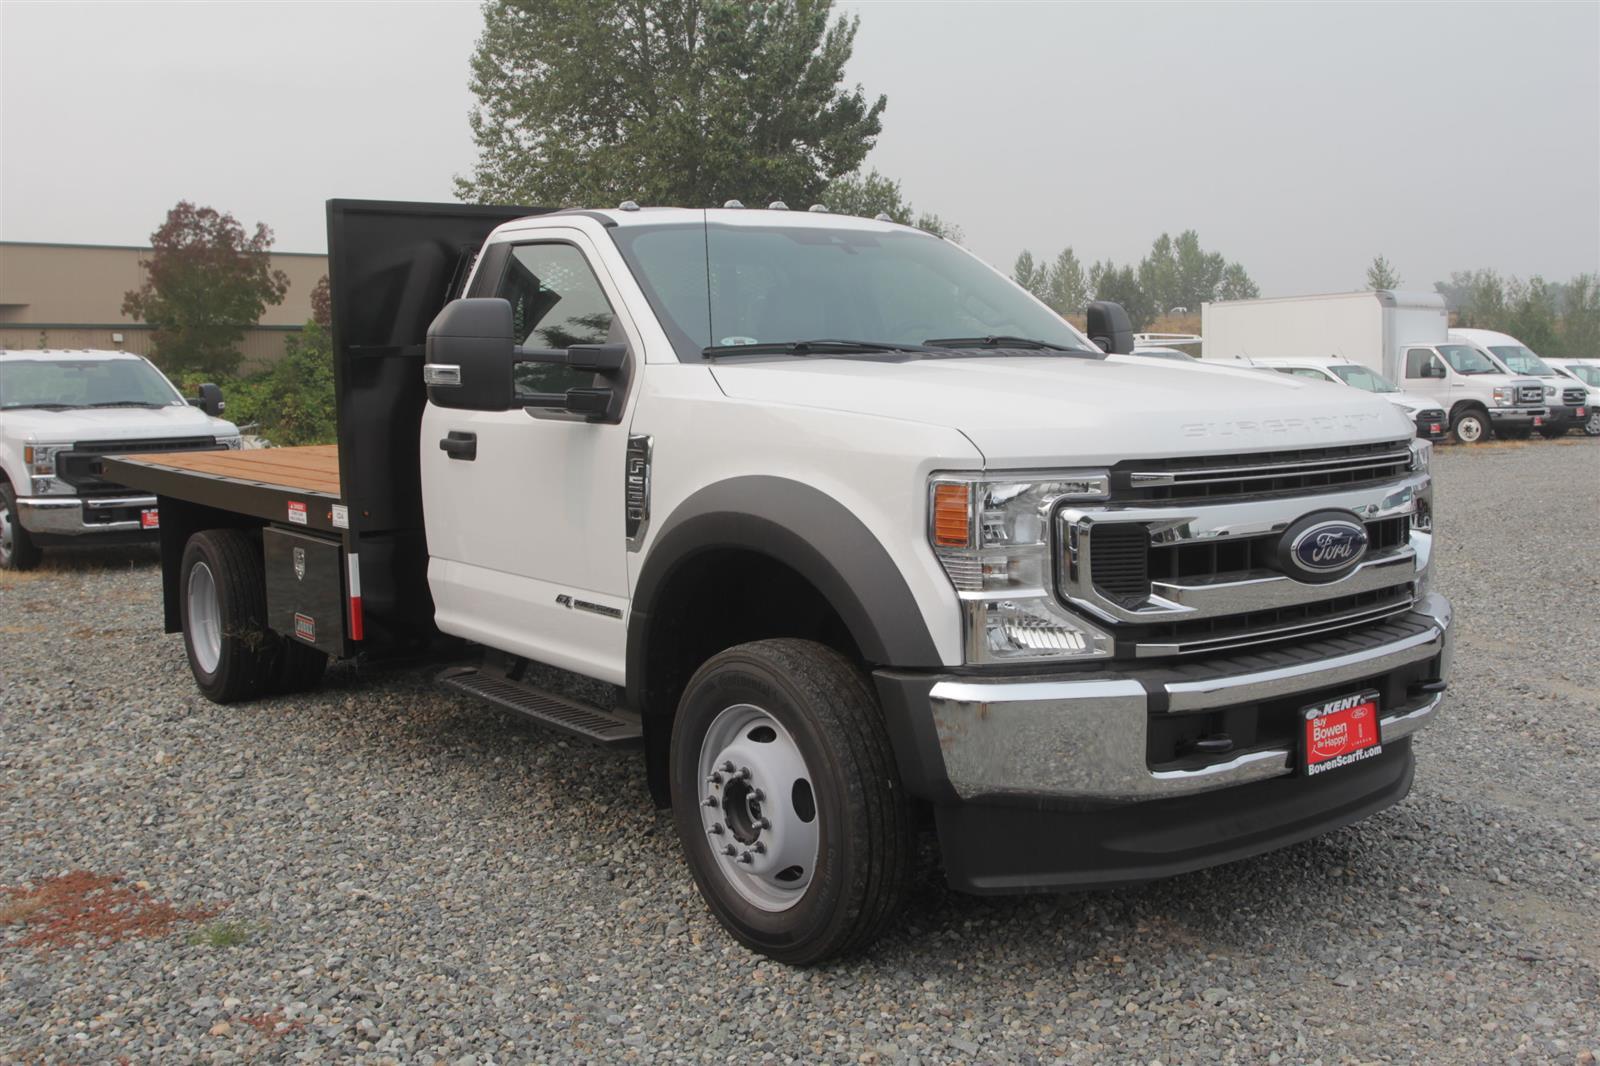 2020 Ford F-550 Regular Cab DRW 4x4, Independent Dealer Accessories Platform Body #E9263 - photo 4